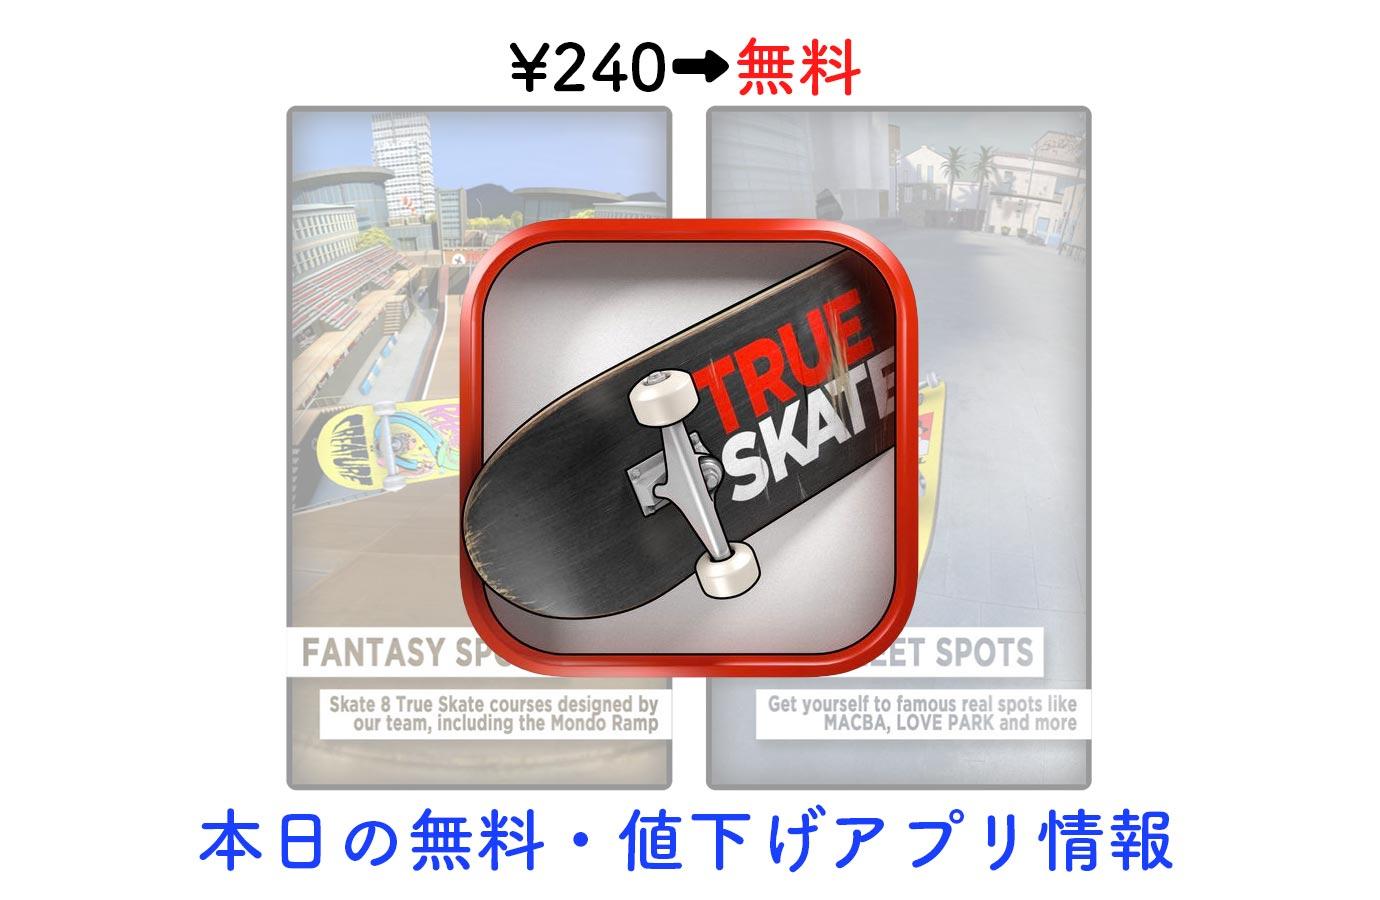 Appsale0527